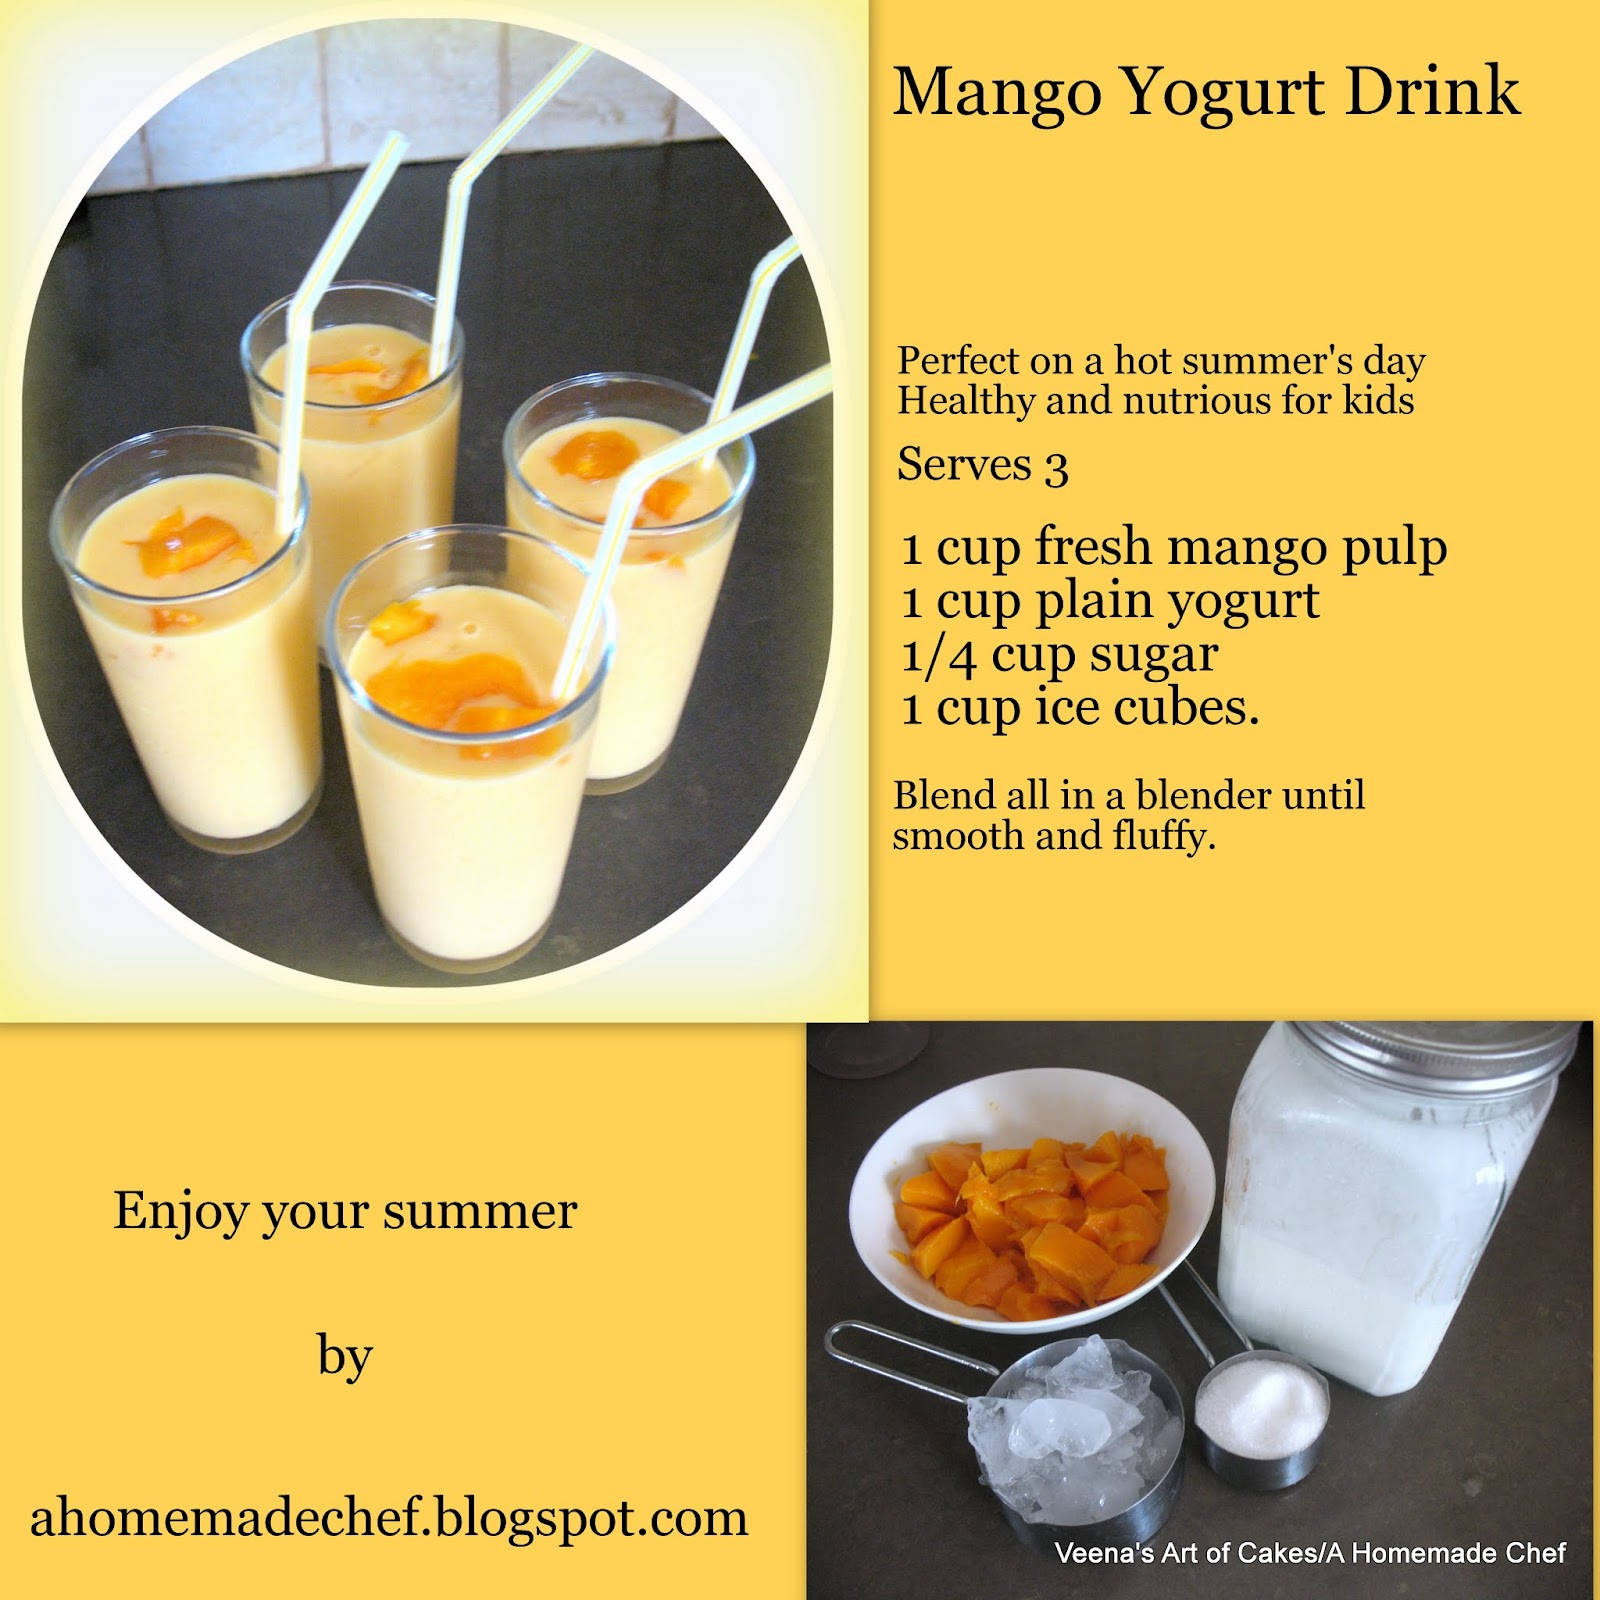 Mango+Yogurt+Drink mango fruit 2 indian beverages drinks